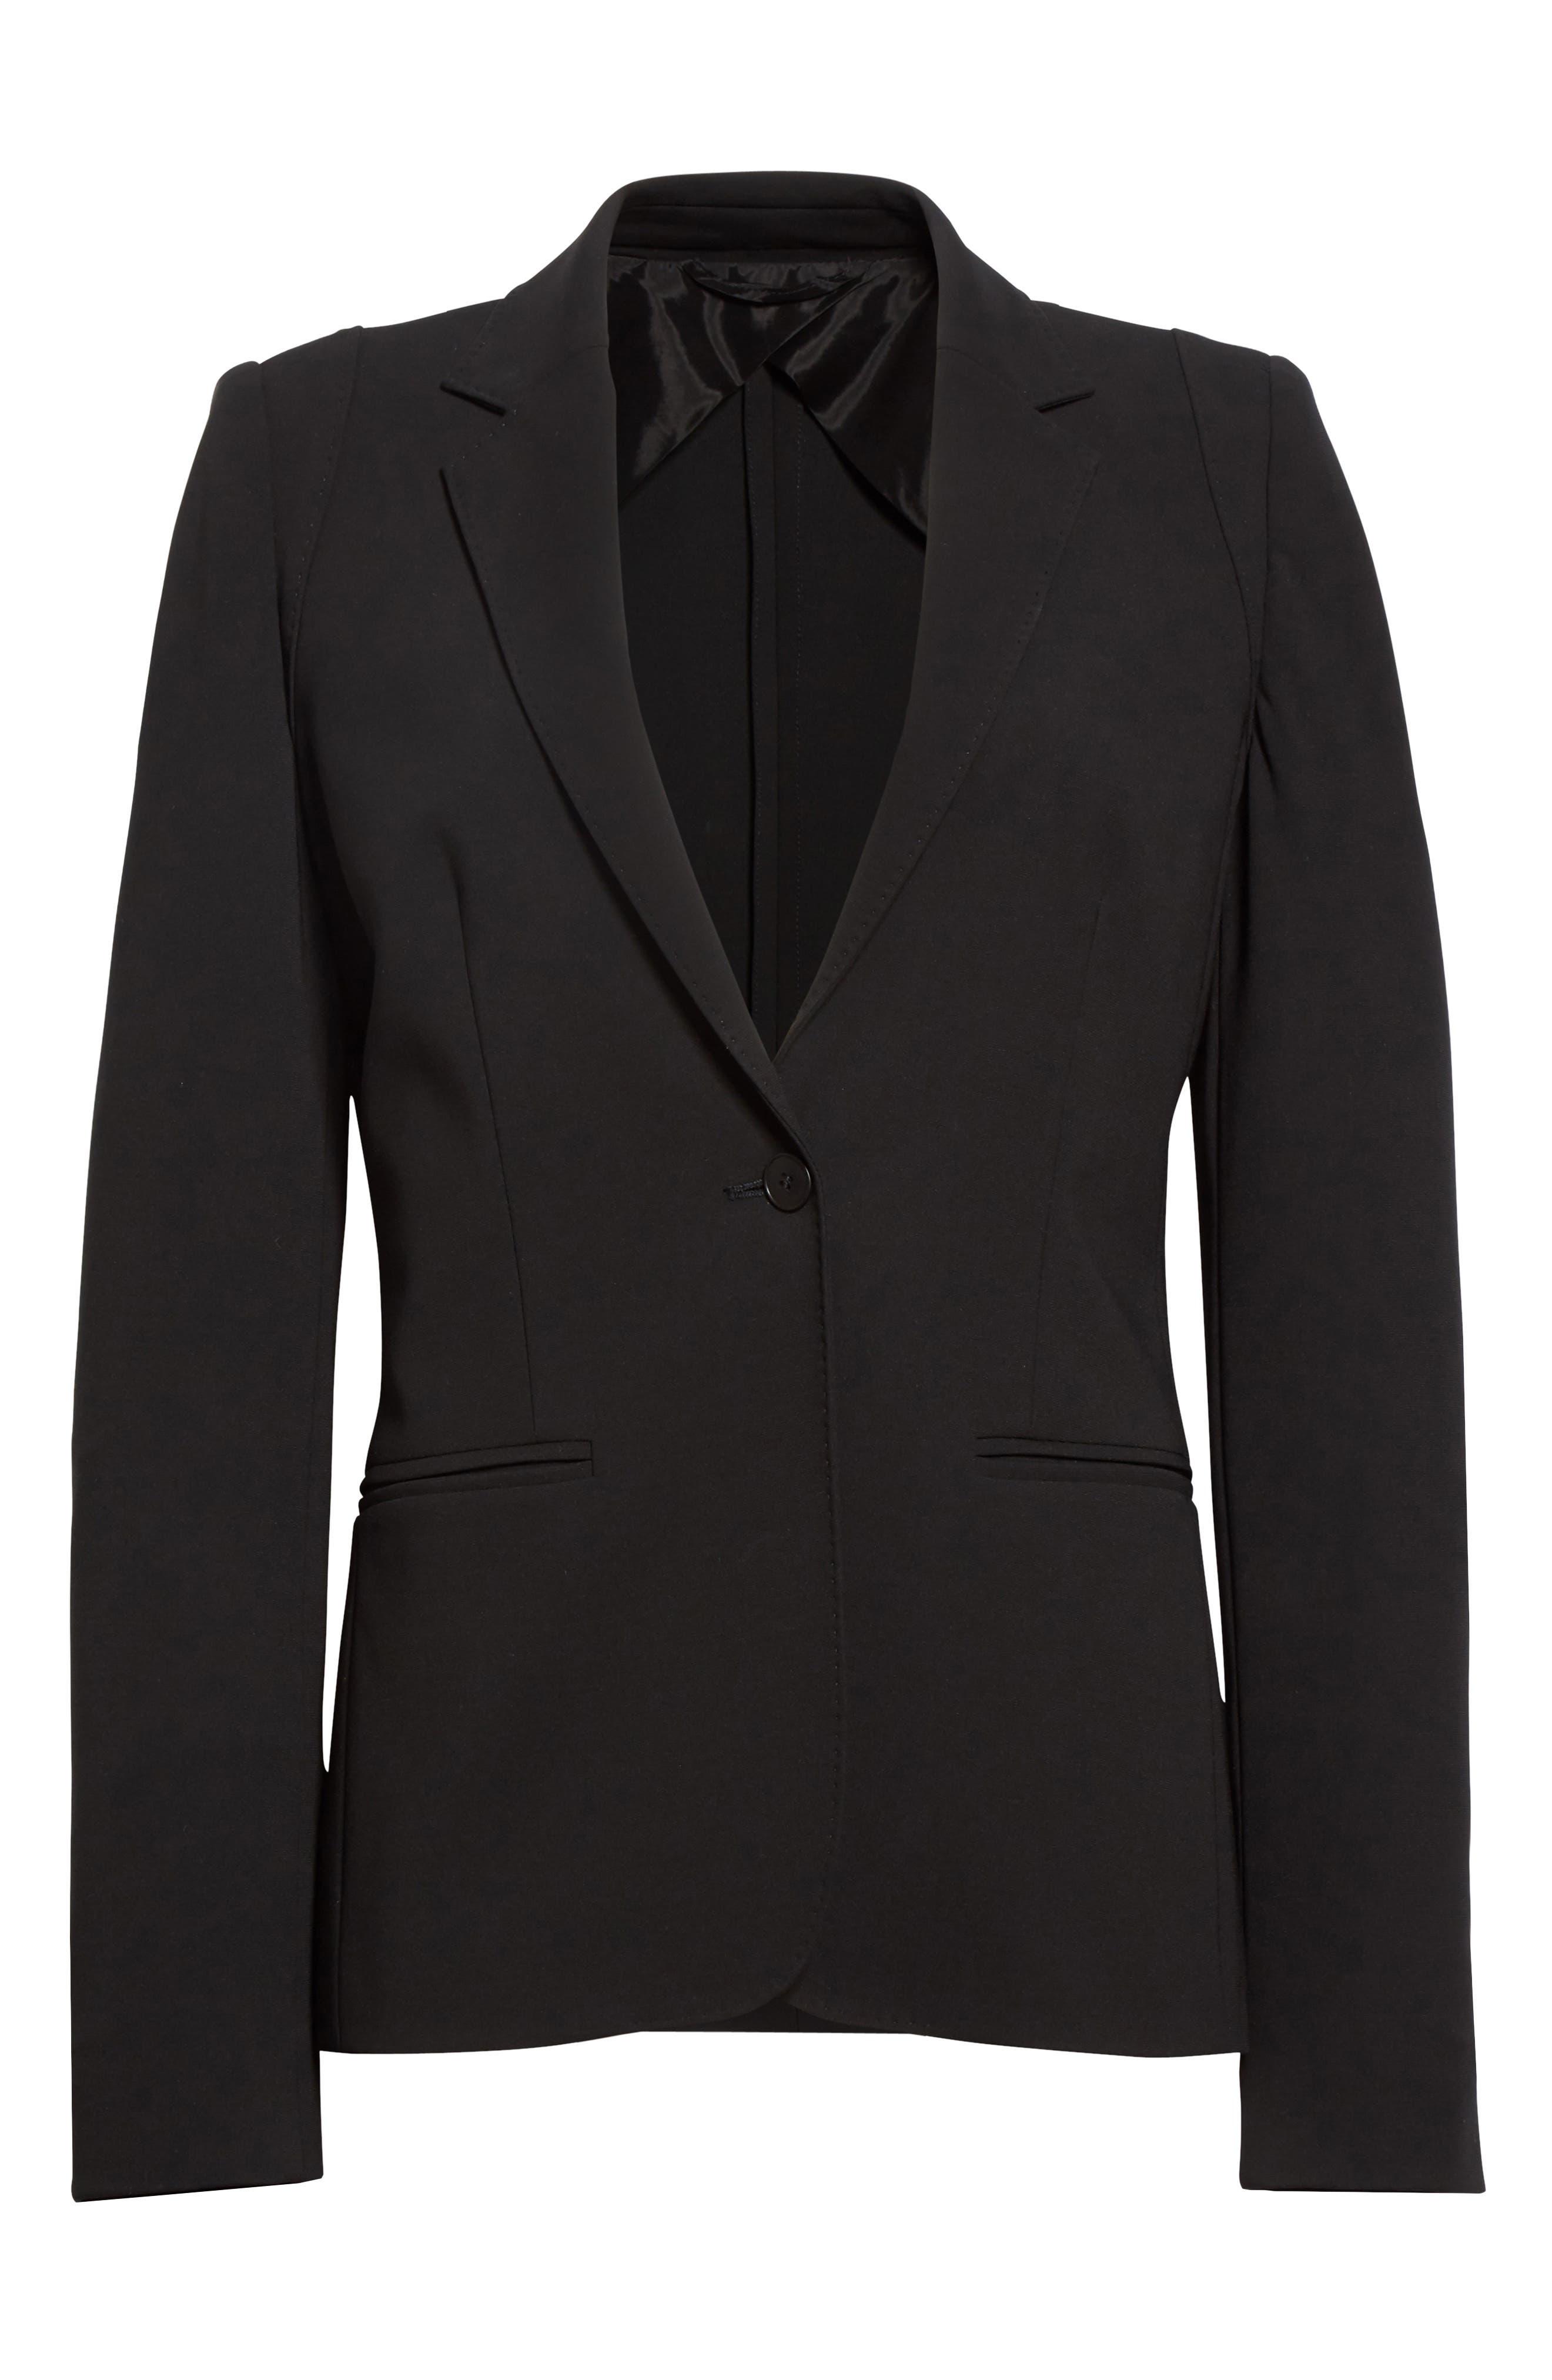 Bari Stretch Jersey Jacket,                             Alternate thumbnail 4, color,                             Black